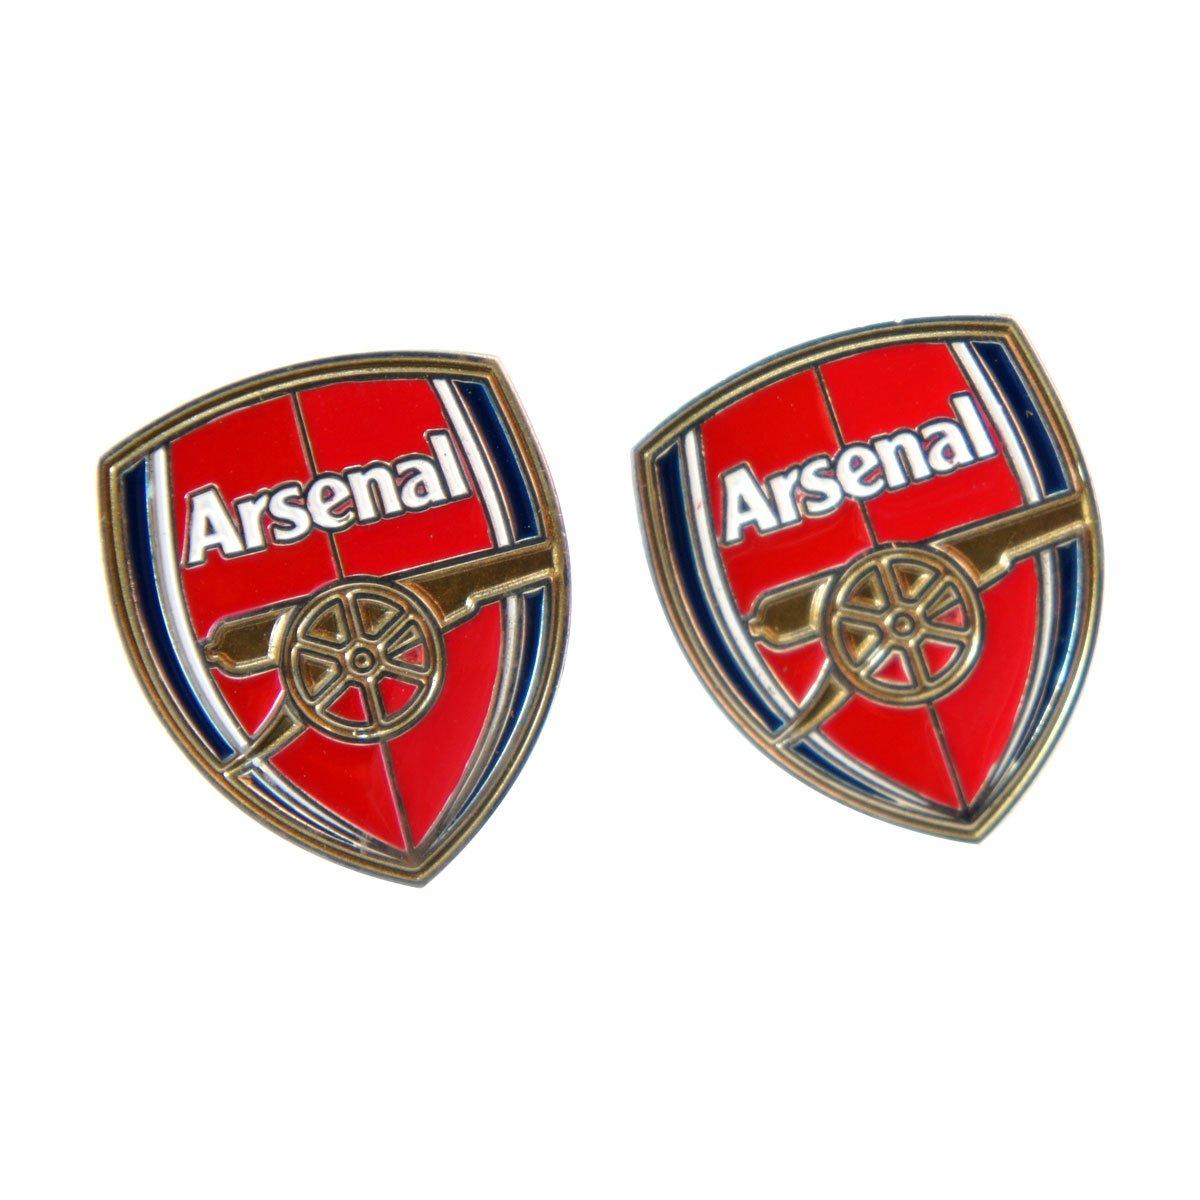 Cufflinks Crest Arsenal F.C Arsenal F C